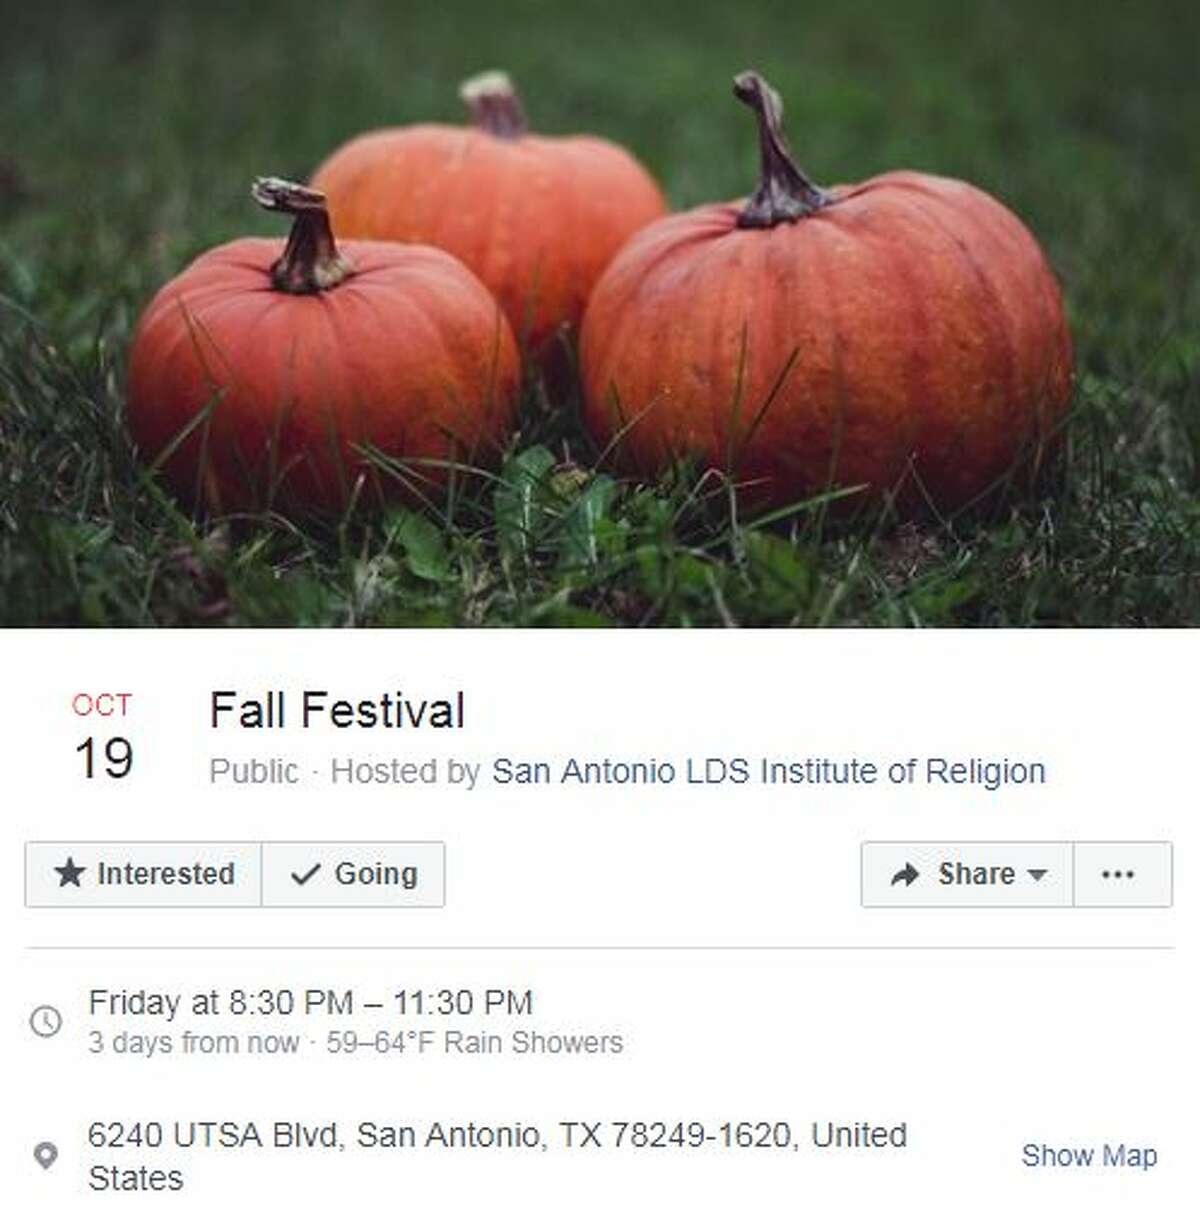 San Antonio LDS Institute of Religion Fall Festival Oct. 19, 8:30 - 11:30 p.m. San Antonio LDS Institute of Religion, 6240 UTSA Boulevard